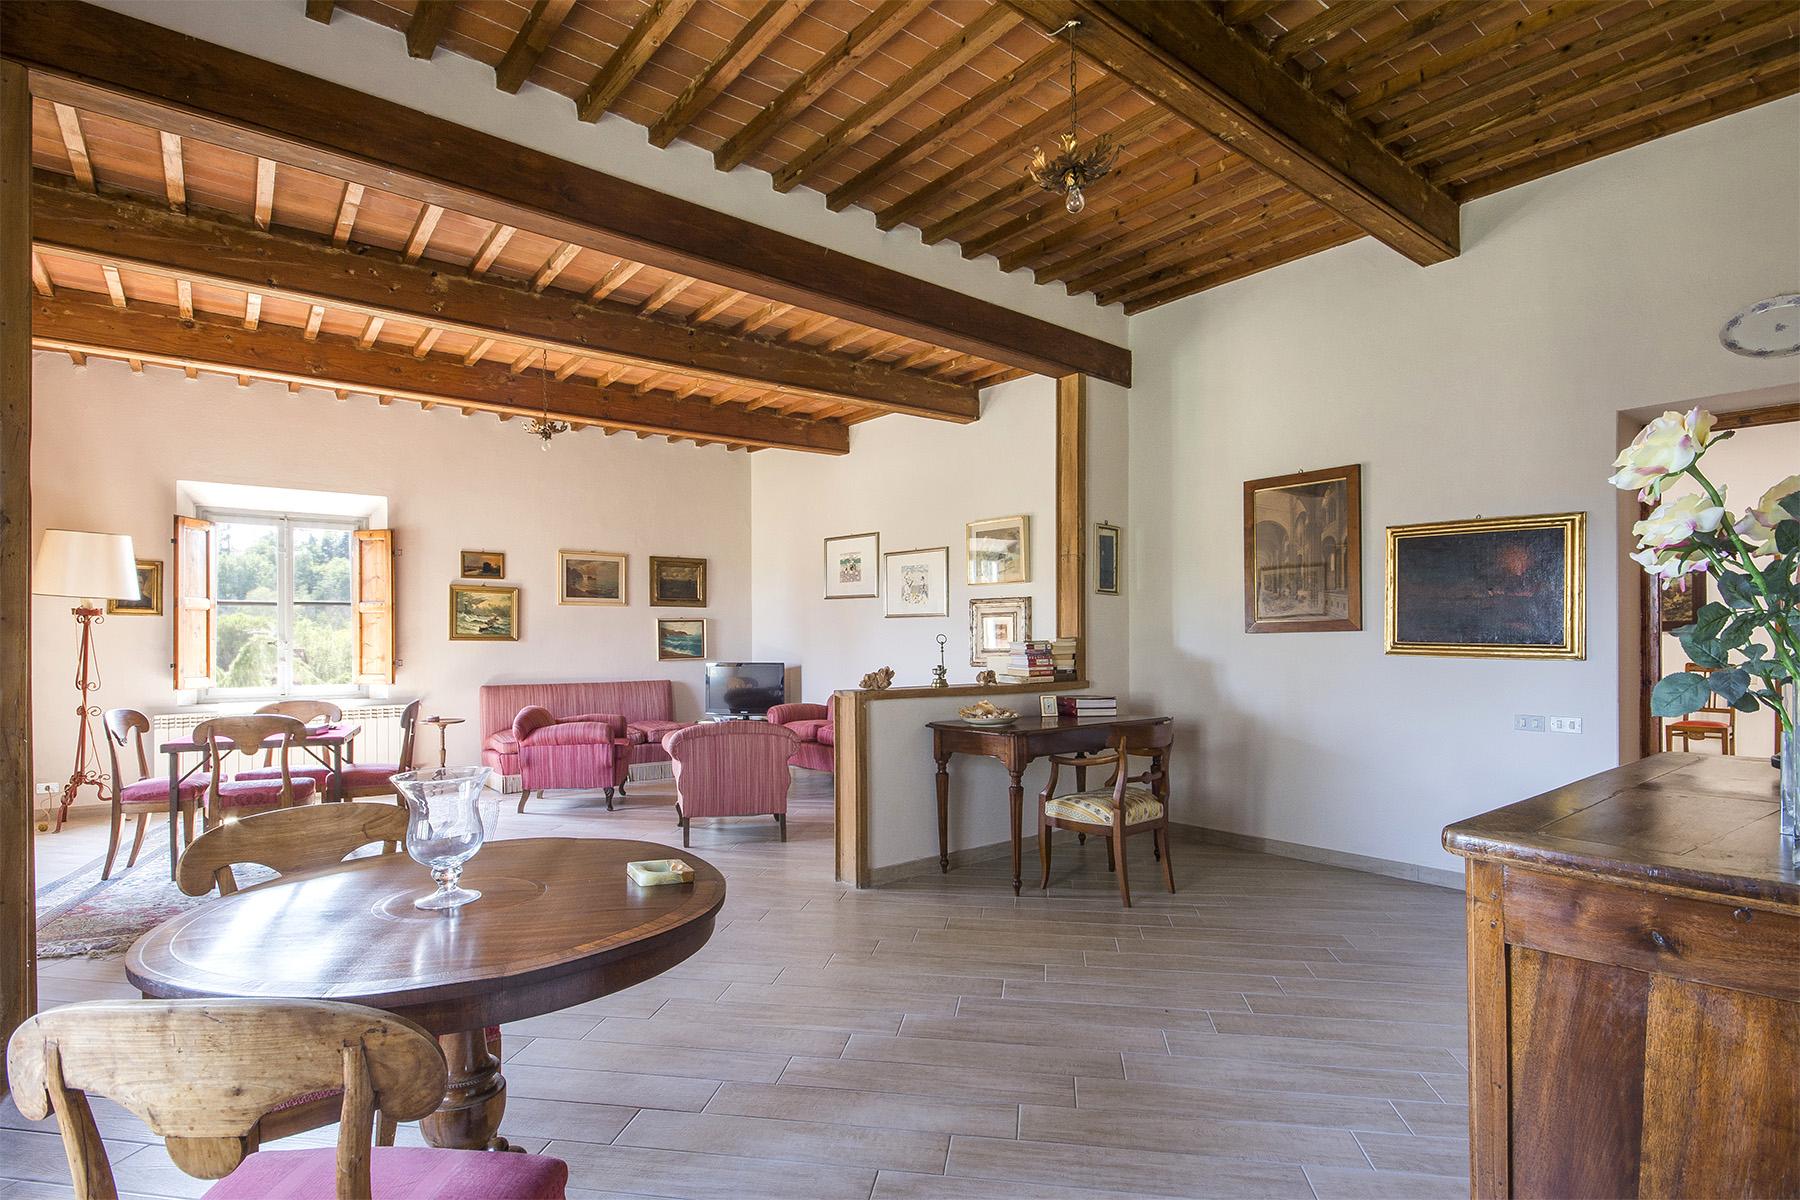 Villa in Vendita a Lucca: 5 locali, 1150 mq - Foto 24